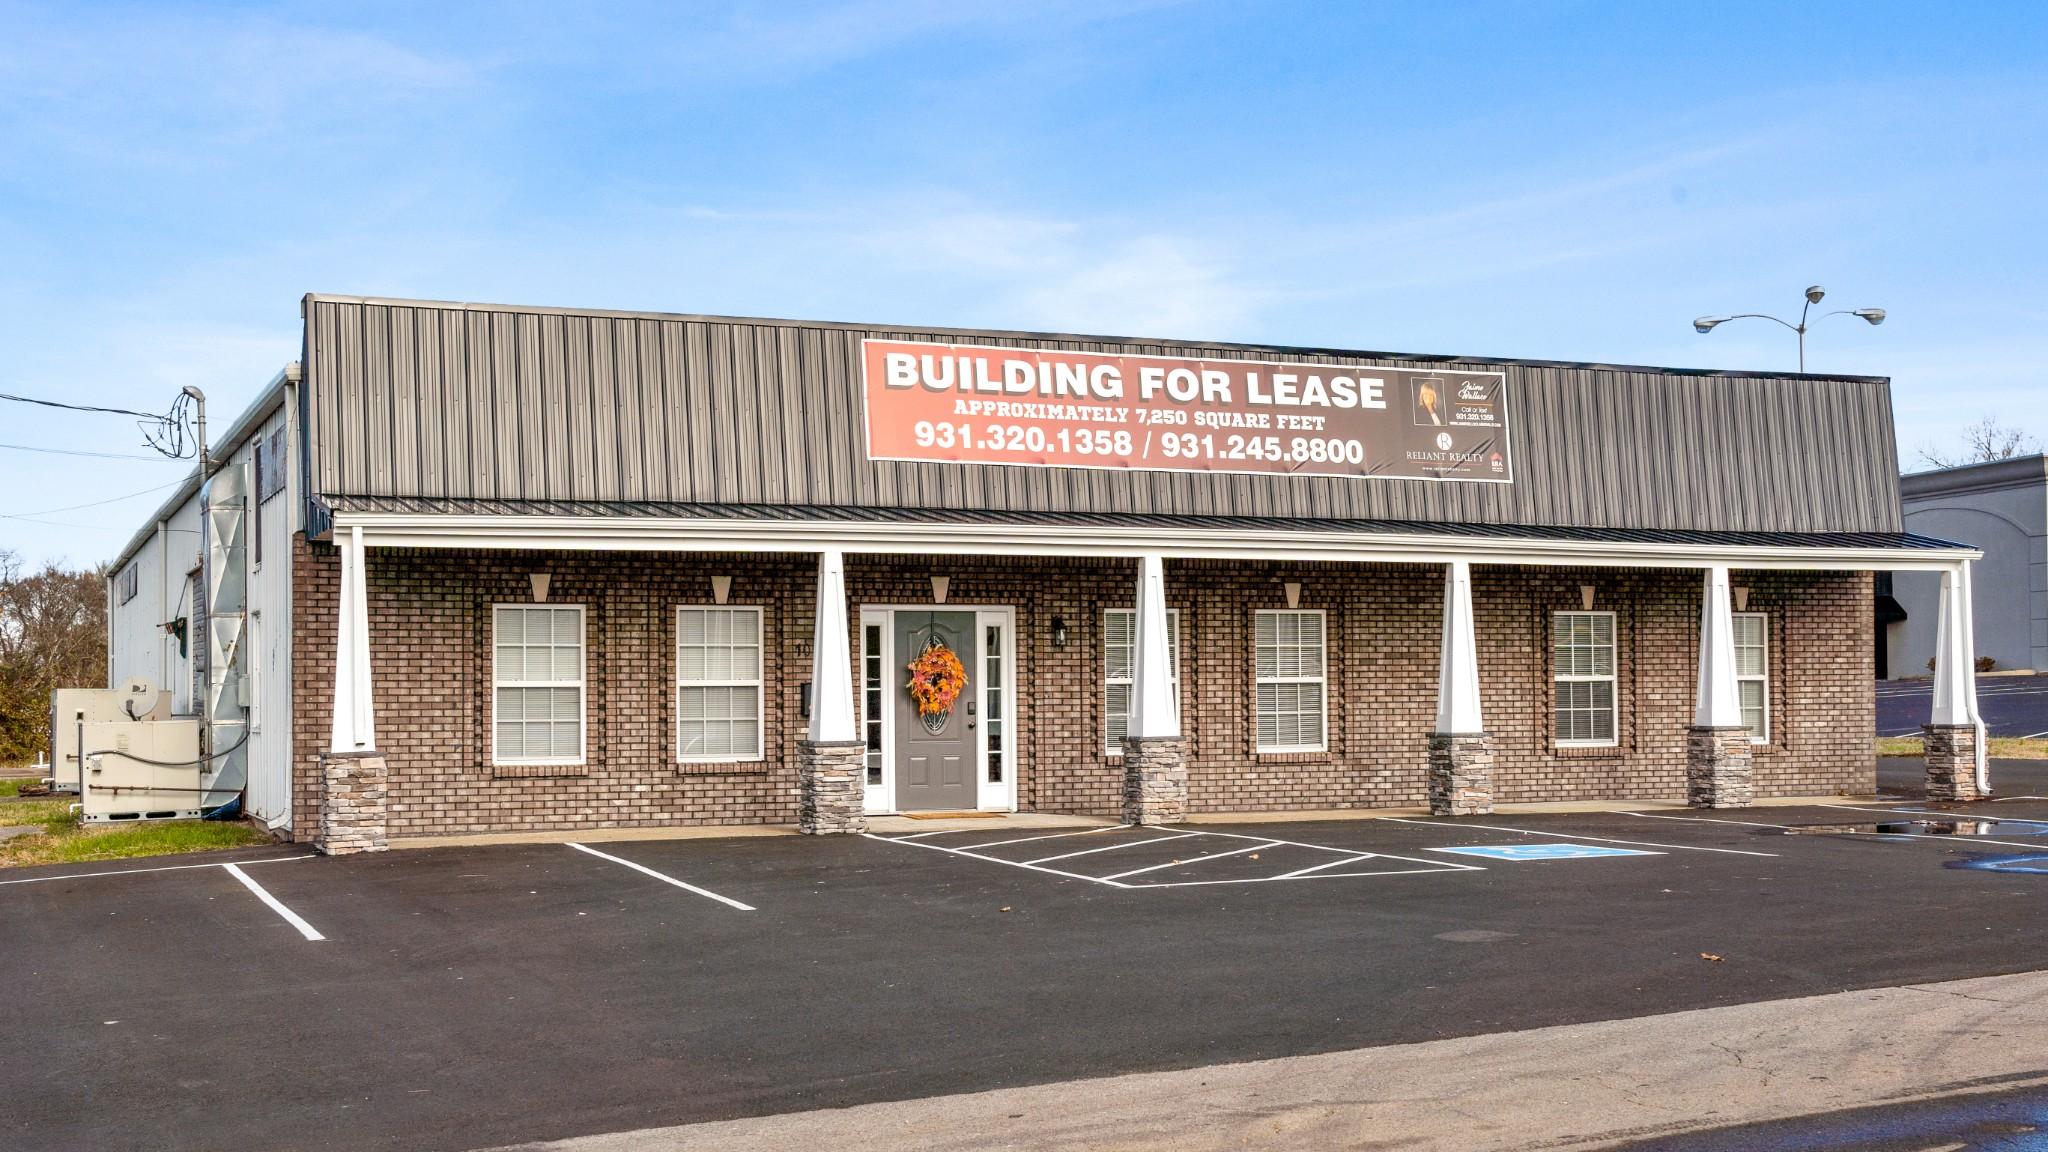 1017 S Riverside Dr, Ste 225I, Clarksville, TN 37040 - Clarksville, TN real estate listing